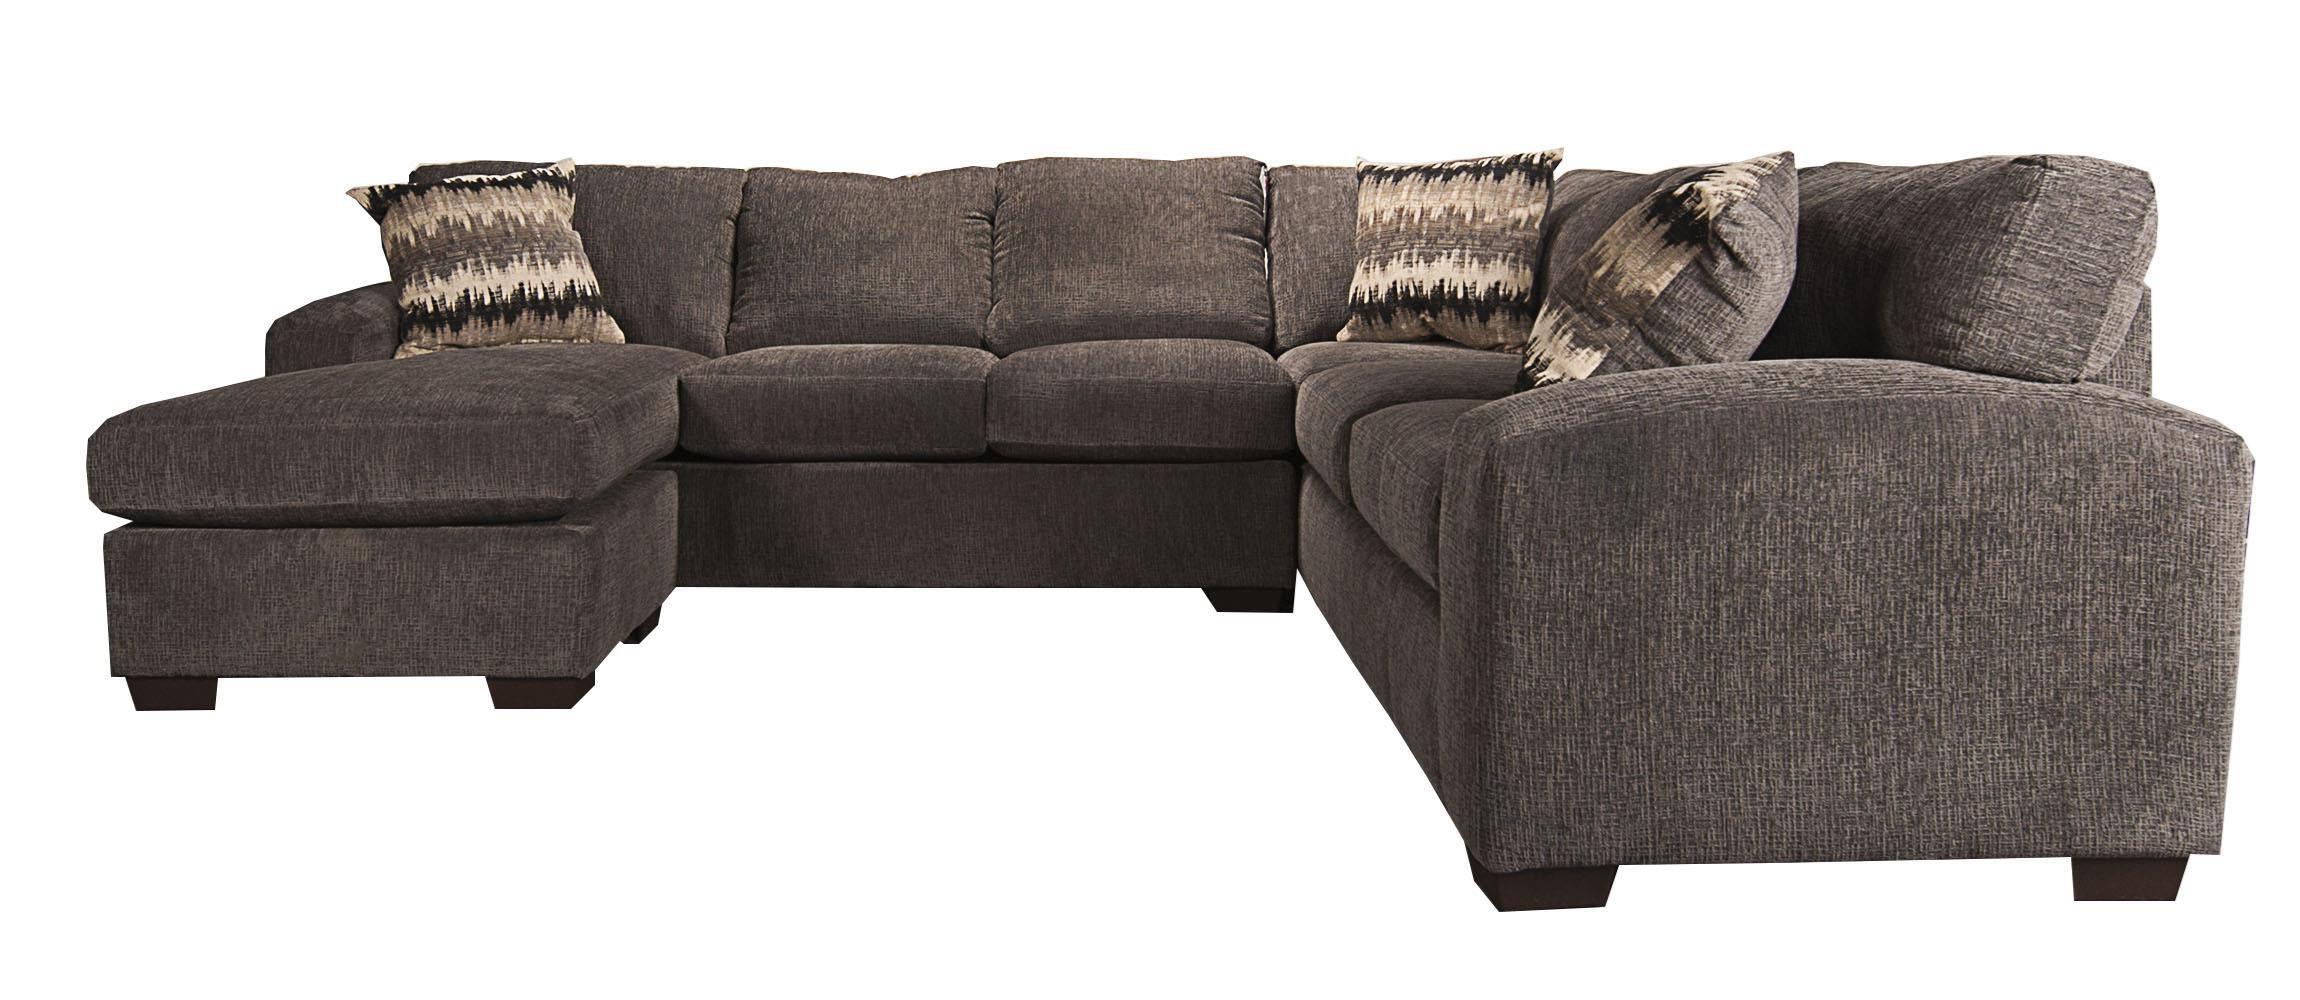 Cyndel Sectional Sofa